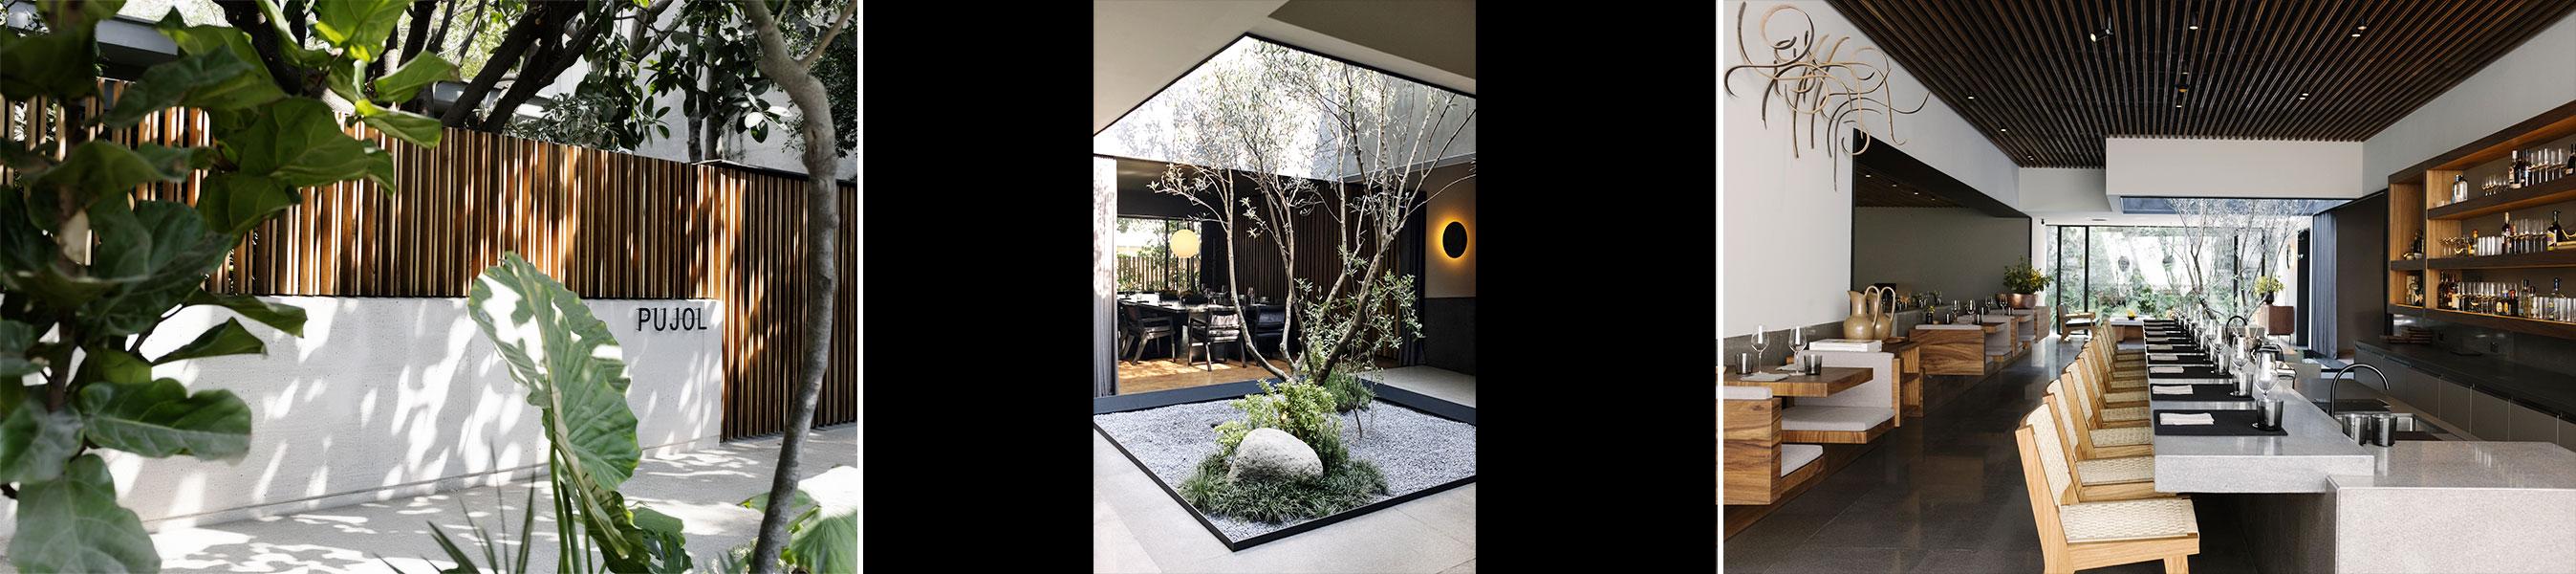 2017 – Restaurante Pujol Tennyson